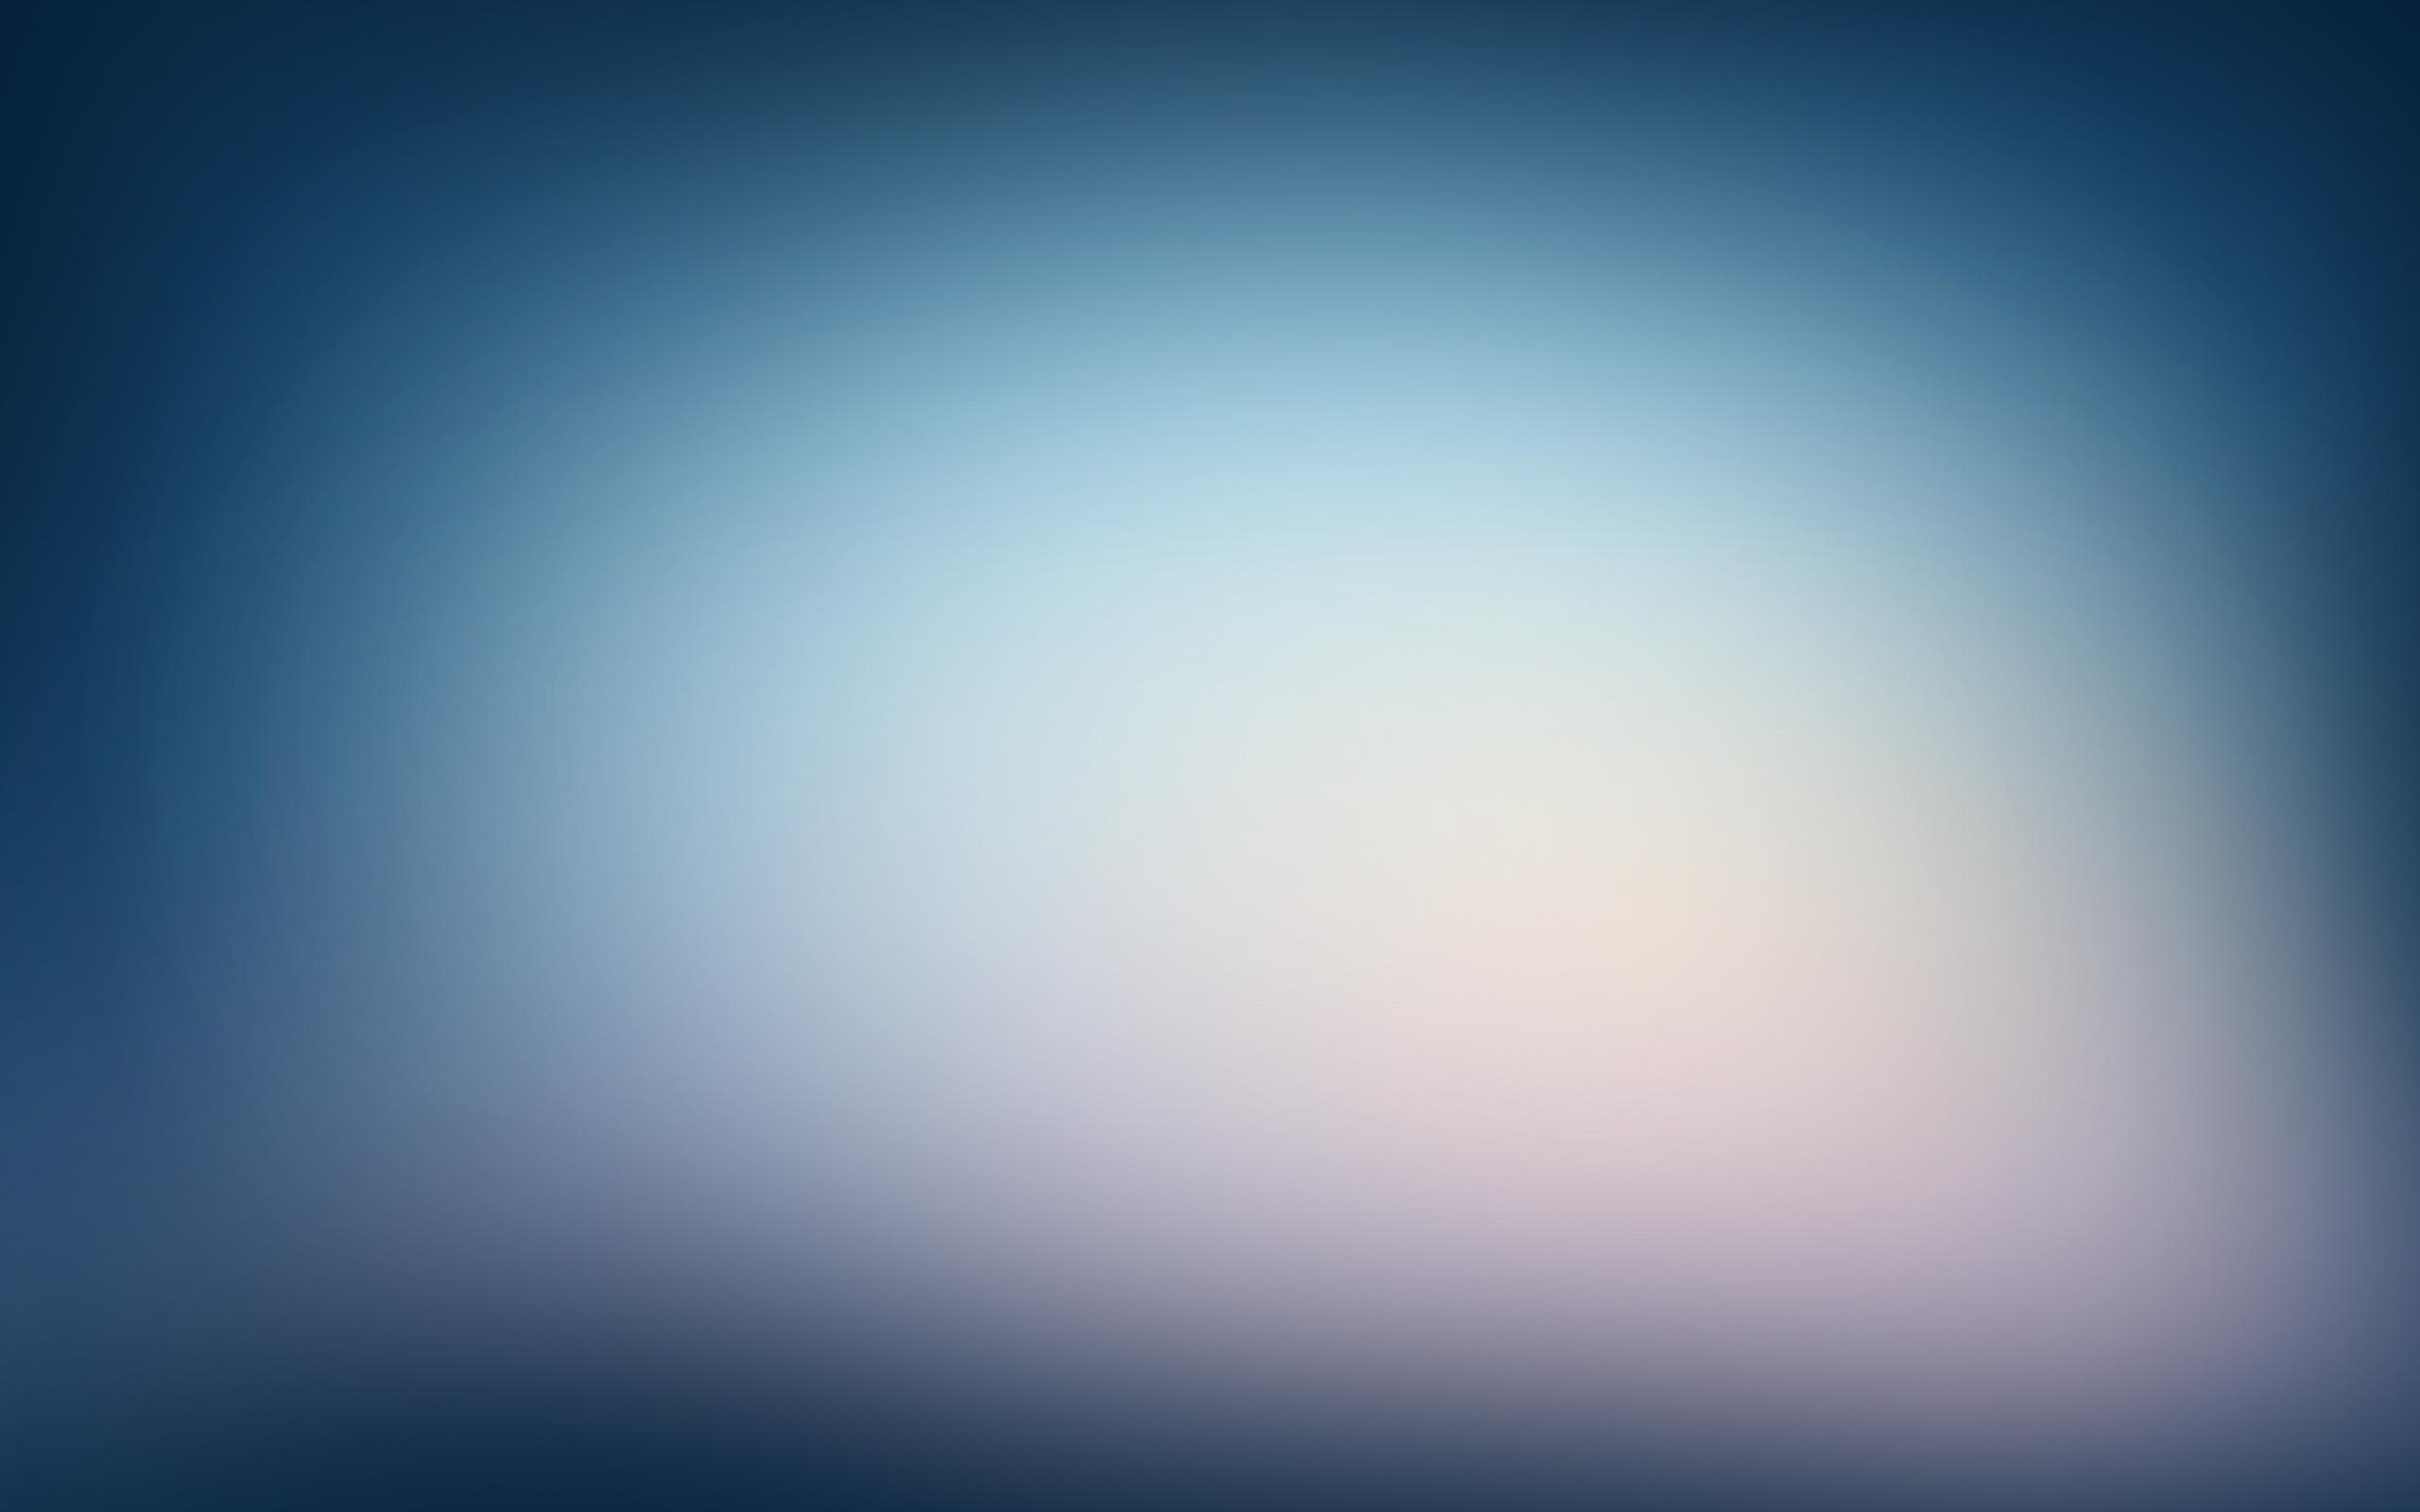 Light Calm Gaussian Blur Gradient Blurred